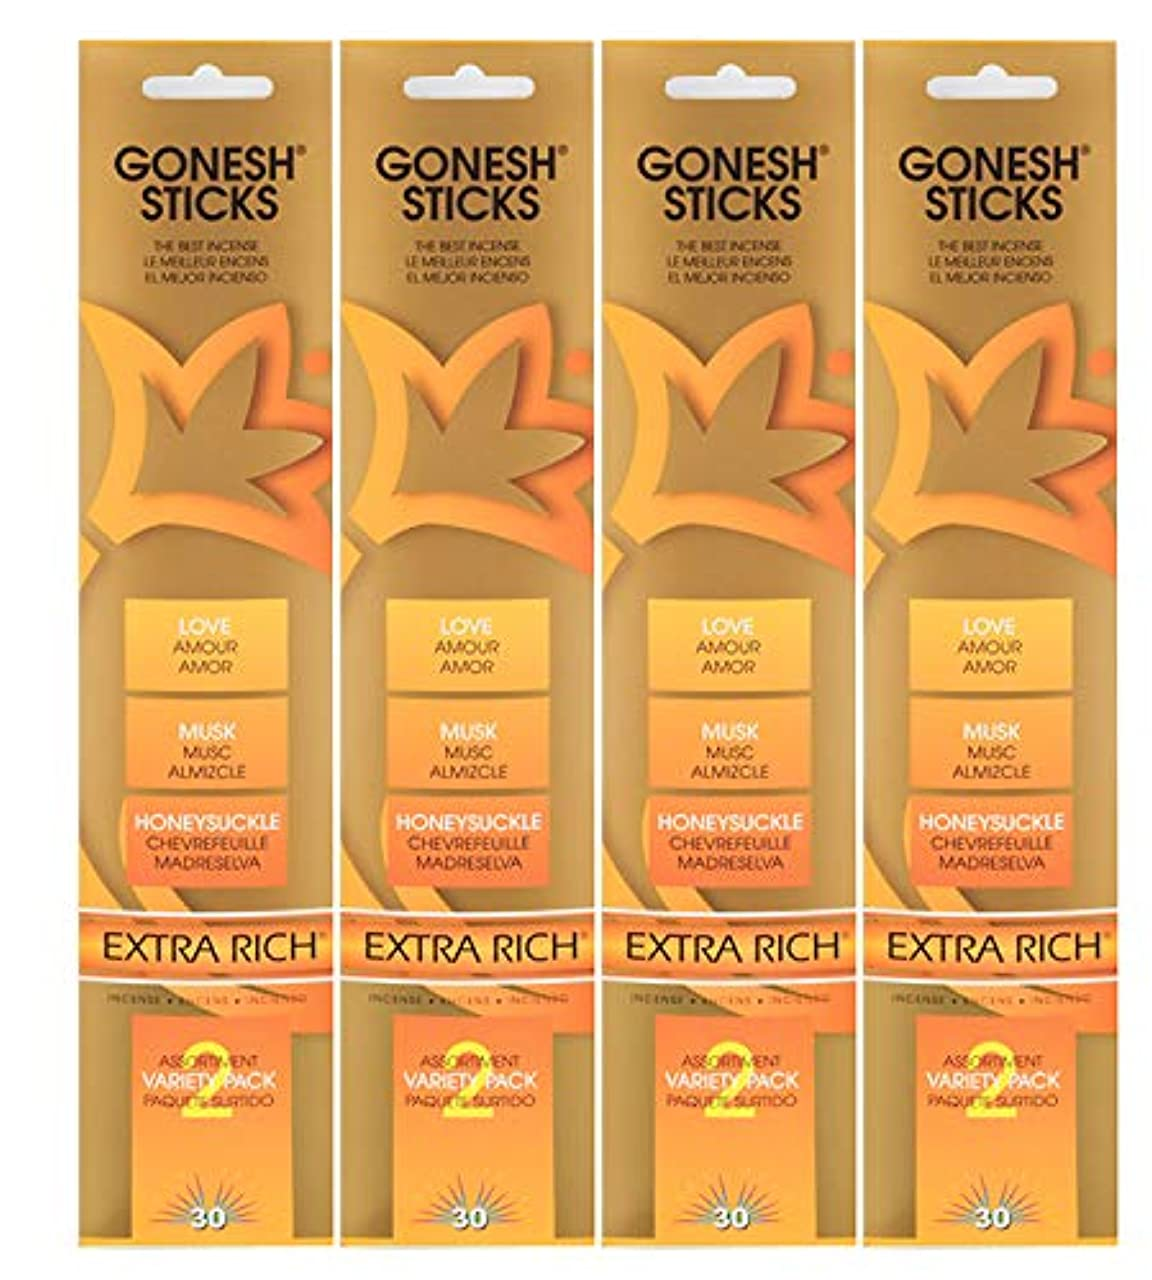 Gonesh Incense Sticks – Extra Rich Variety Pack # 2 (愛、ムスク、スイカズラ) Lot of 4